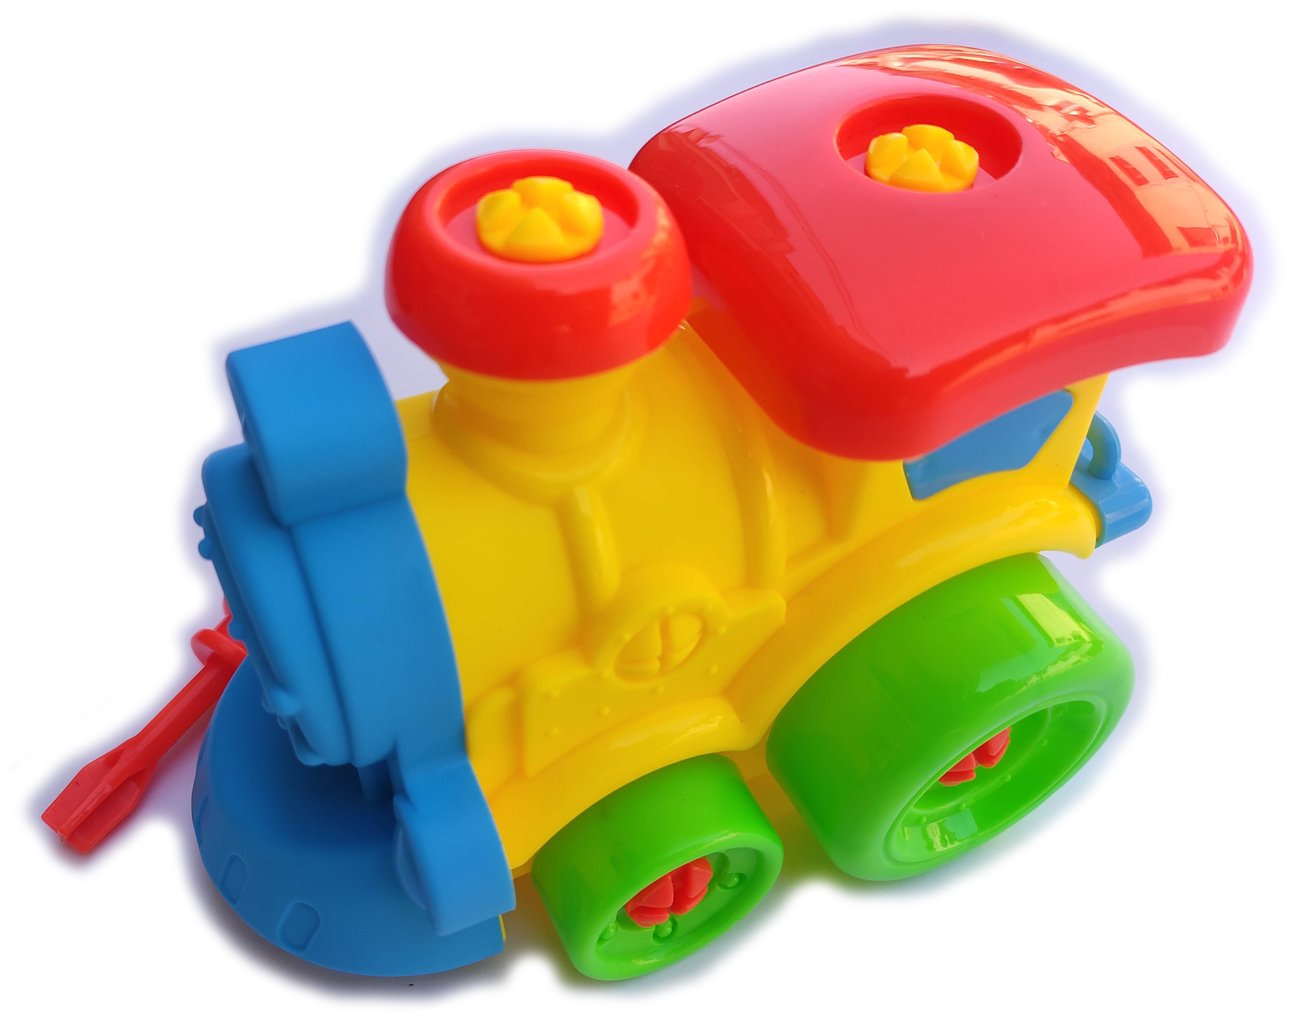 Детска играчка Конструктор с форма на Локомотив с инструмент